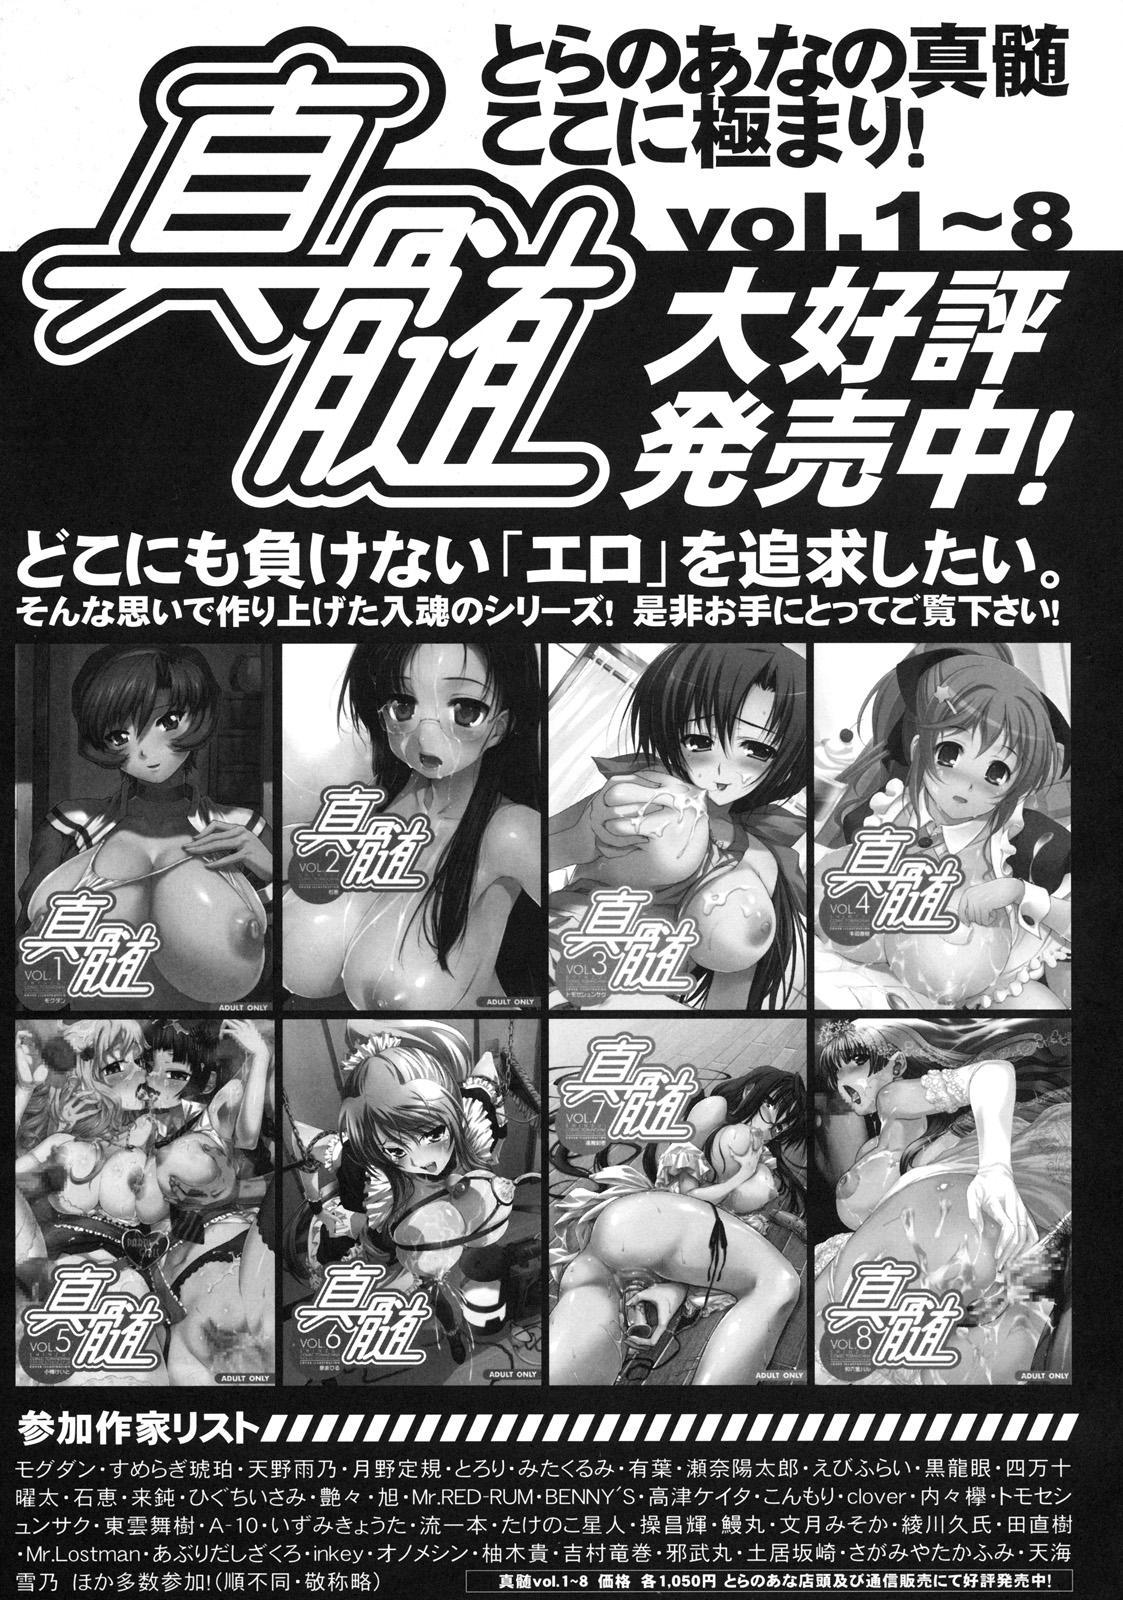 Shinzui Valentine Special Vol. 1 103